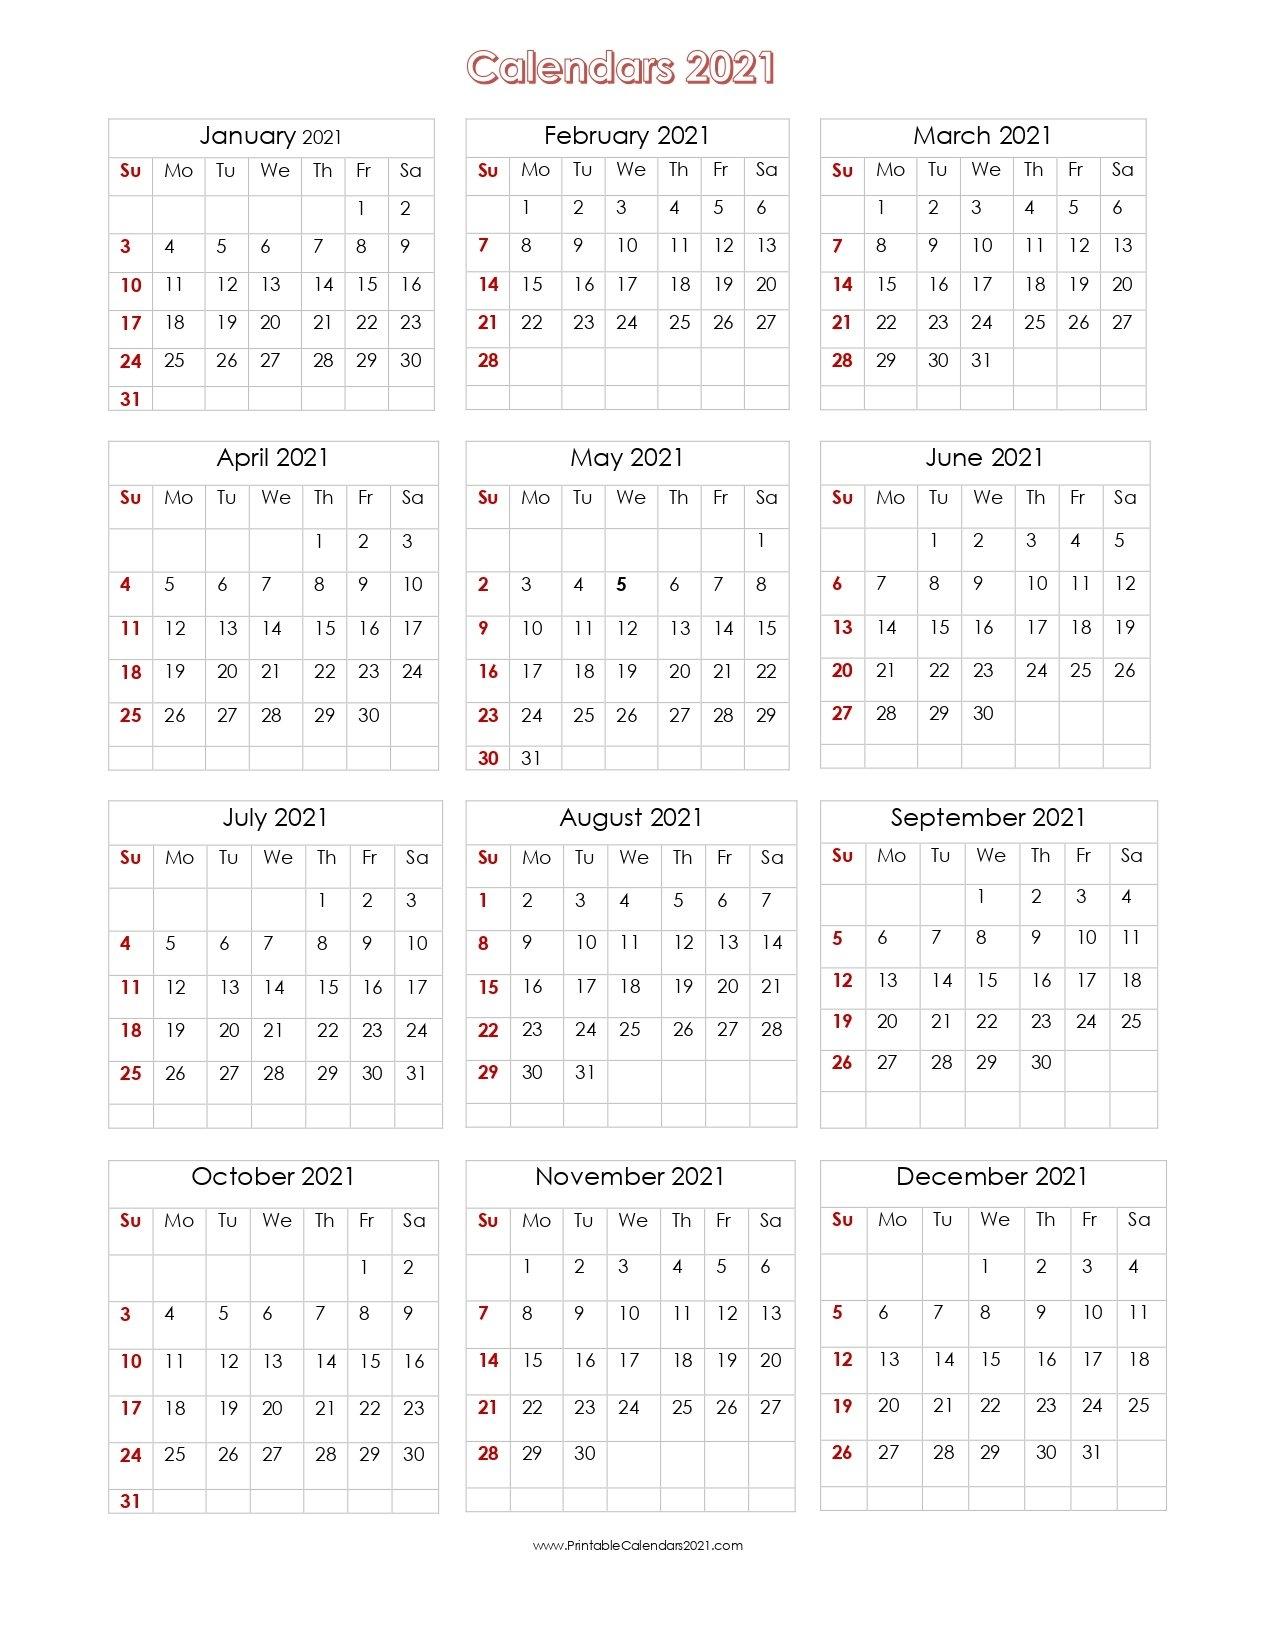 56+ Printable Calendar 2021 One Page, Printable 2021 Yearly Calendar with One Page 2021 Calendar Printable Images